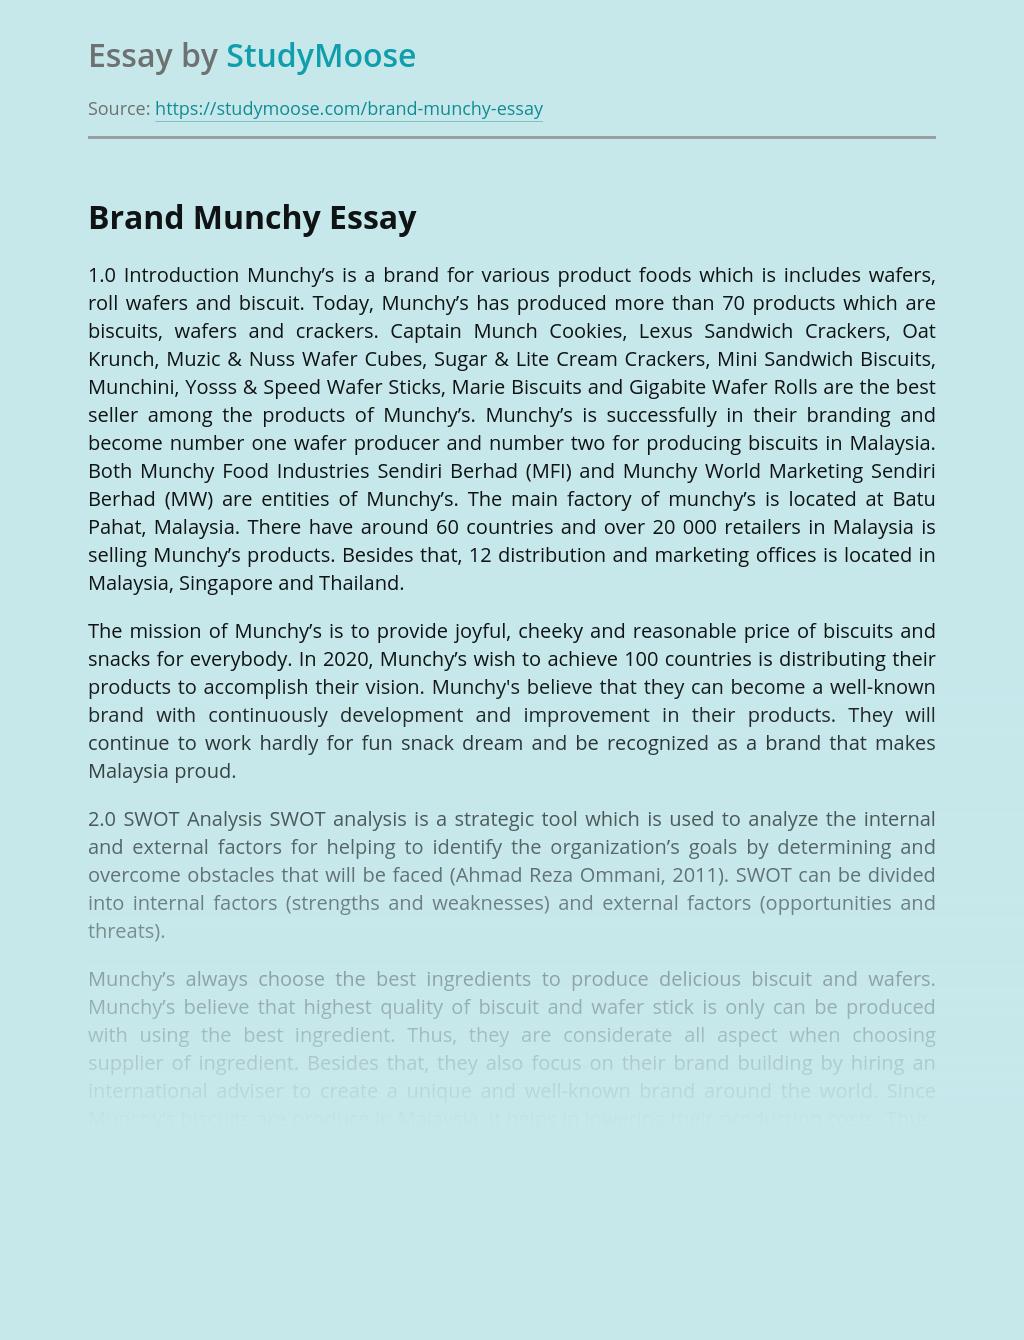 Brand Munchy